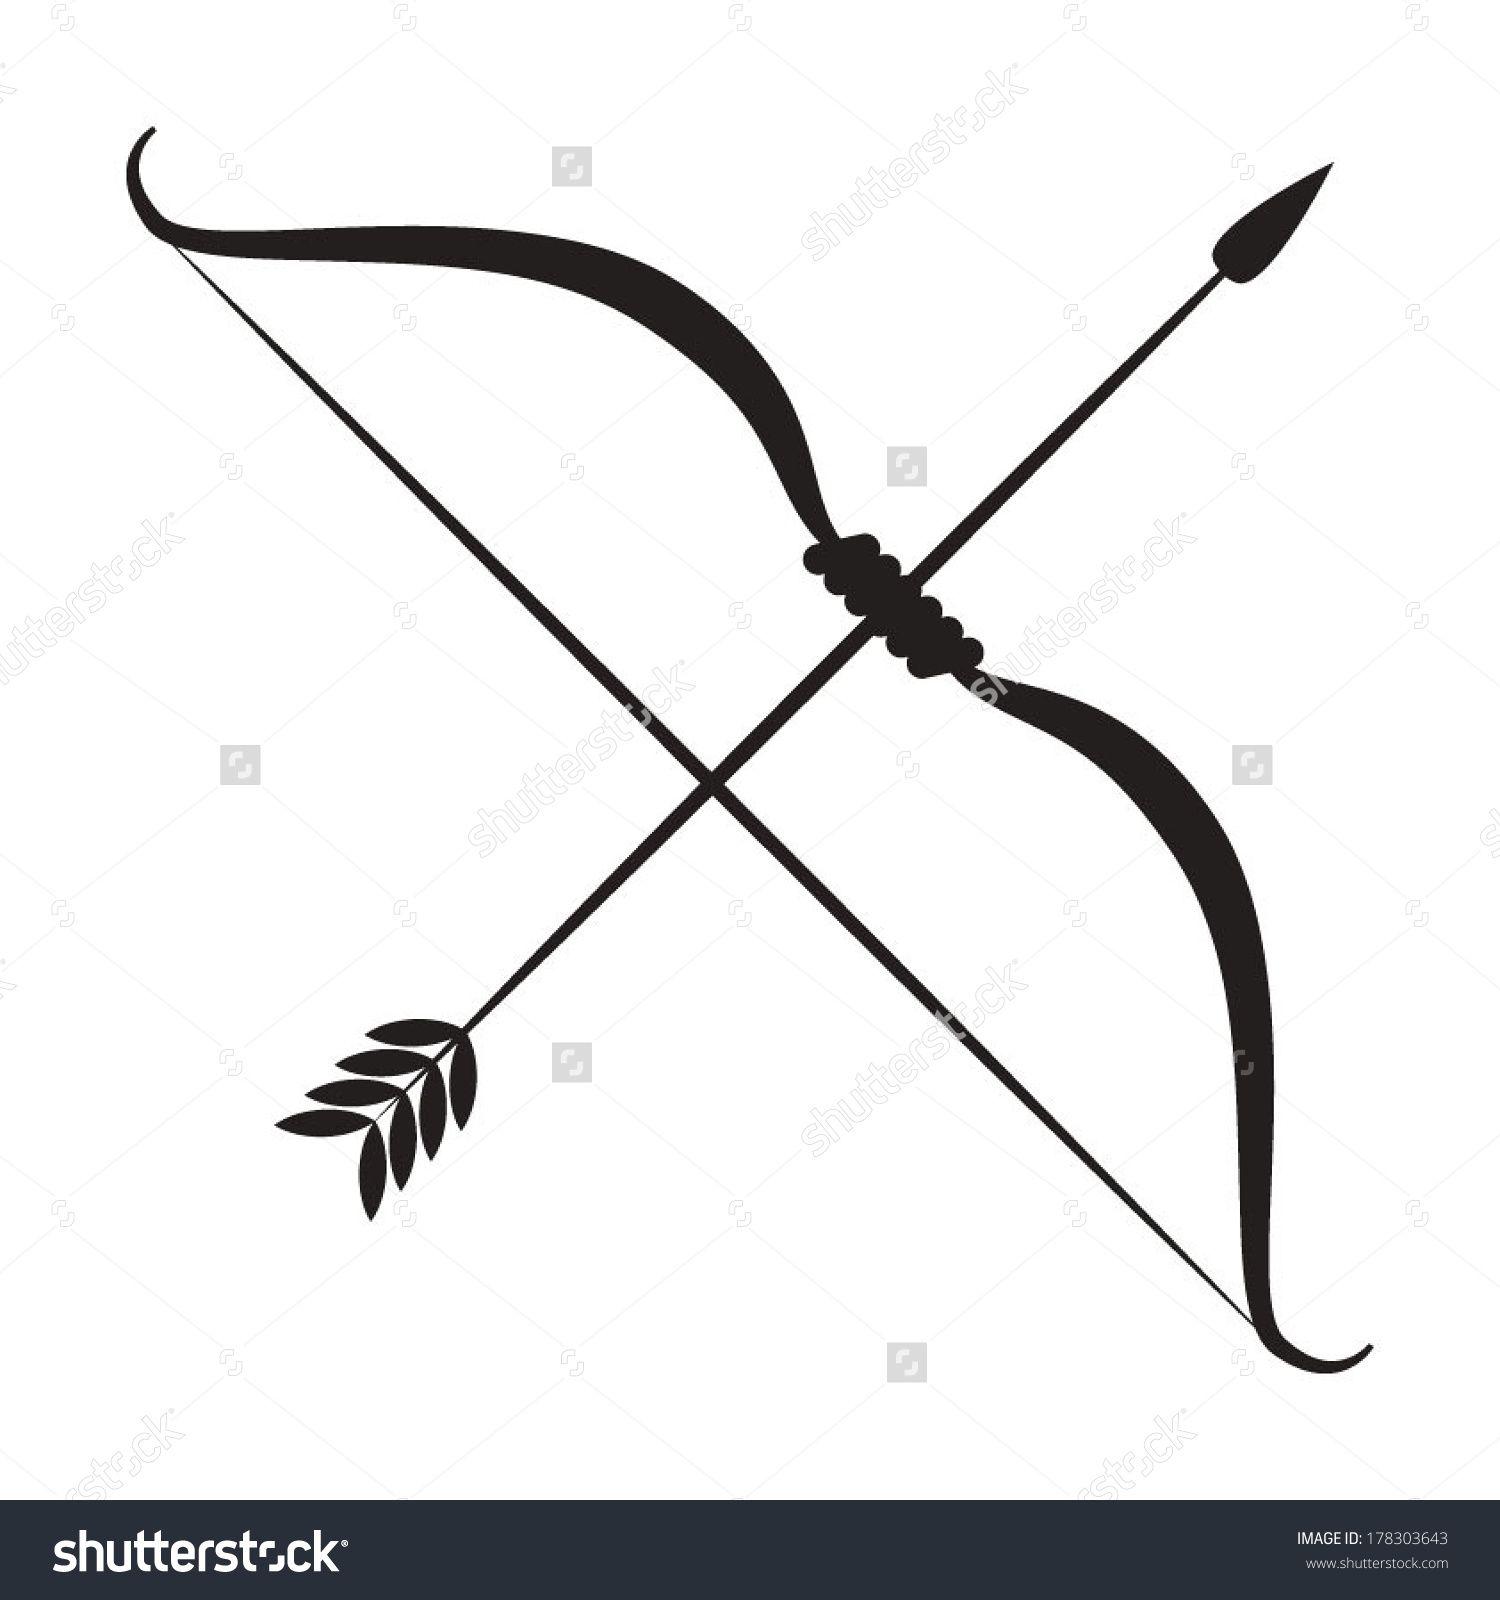 Https Image Shutterstock Com Z Stock Vector Bow And Arrow 178303643 Jpg Bow Arrow Tattoos Mens Arrow Tattoo Arrow Silhouette